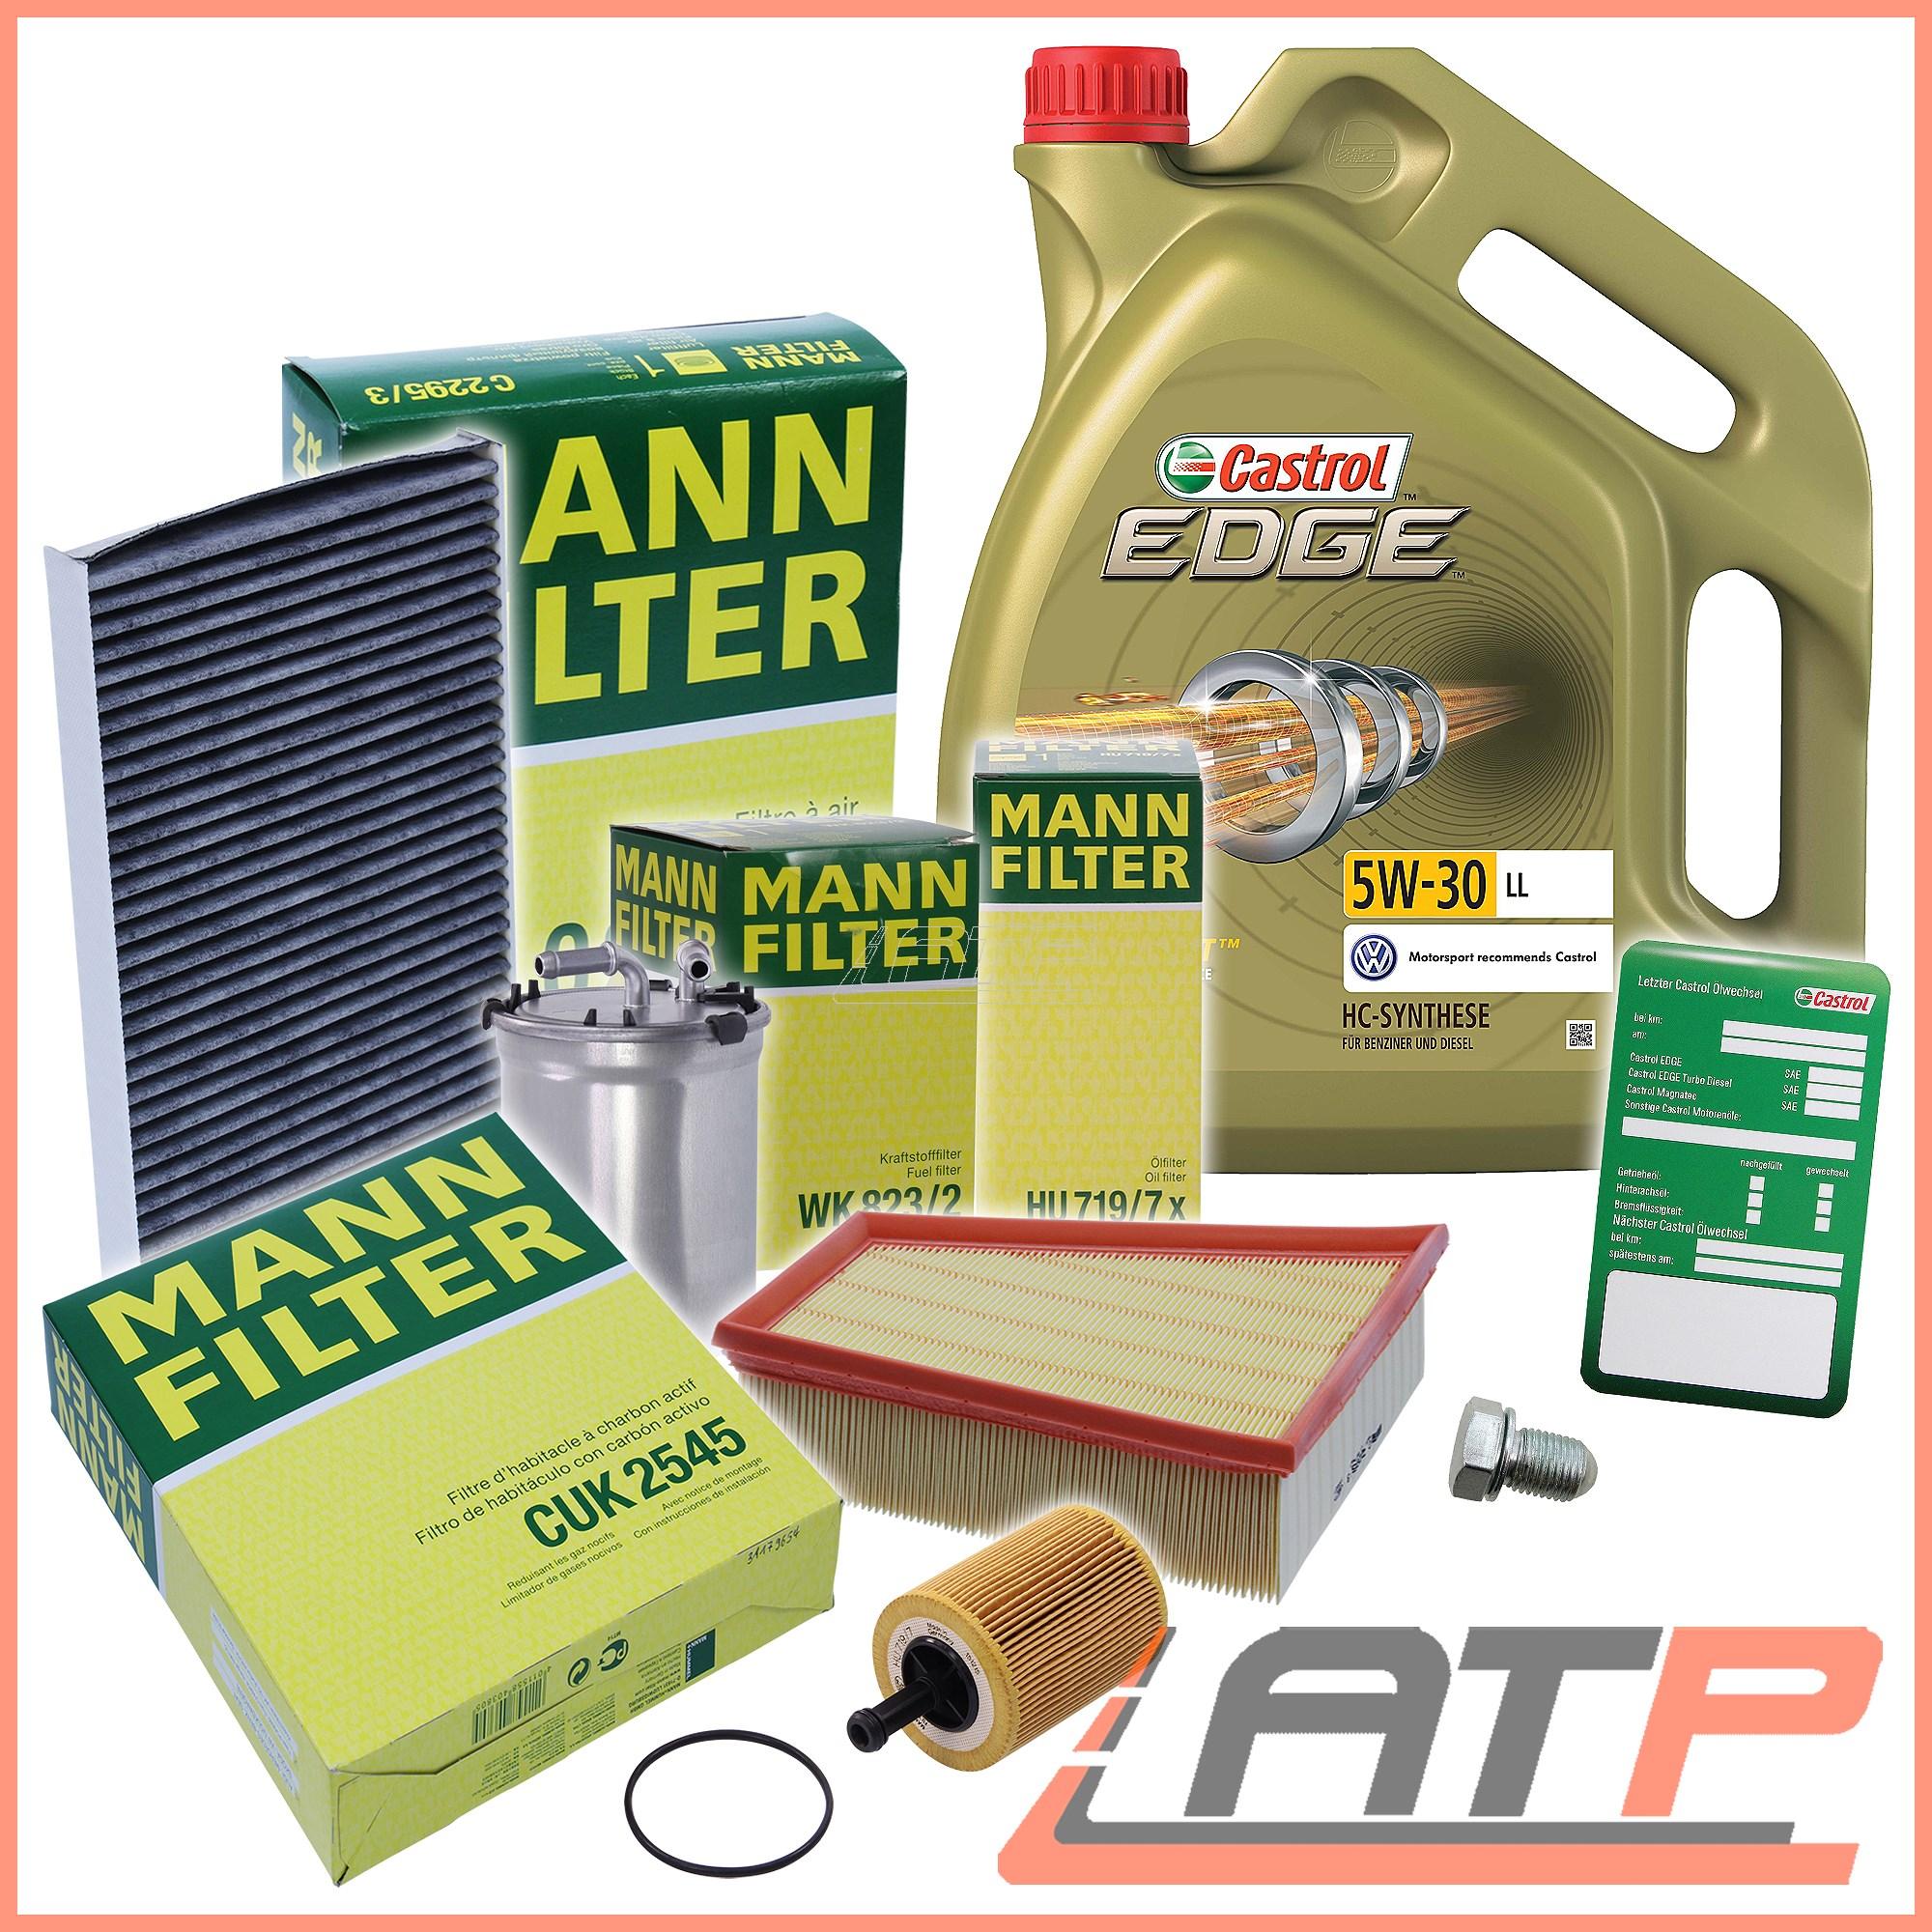 hight resolution of mann filter service kit 5l castrol 5w 30 ll seat ibiza mk 5 mann filter service kit 5l castrol 5w 30 ll seat ibiza mk 5 6j 1 4 1 9 08 10 1 sur 6